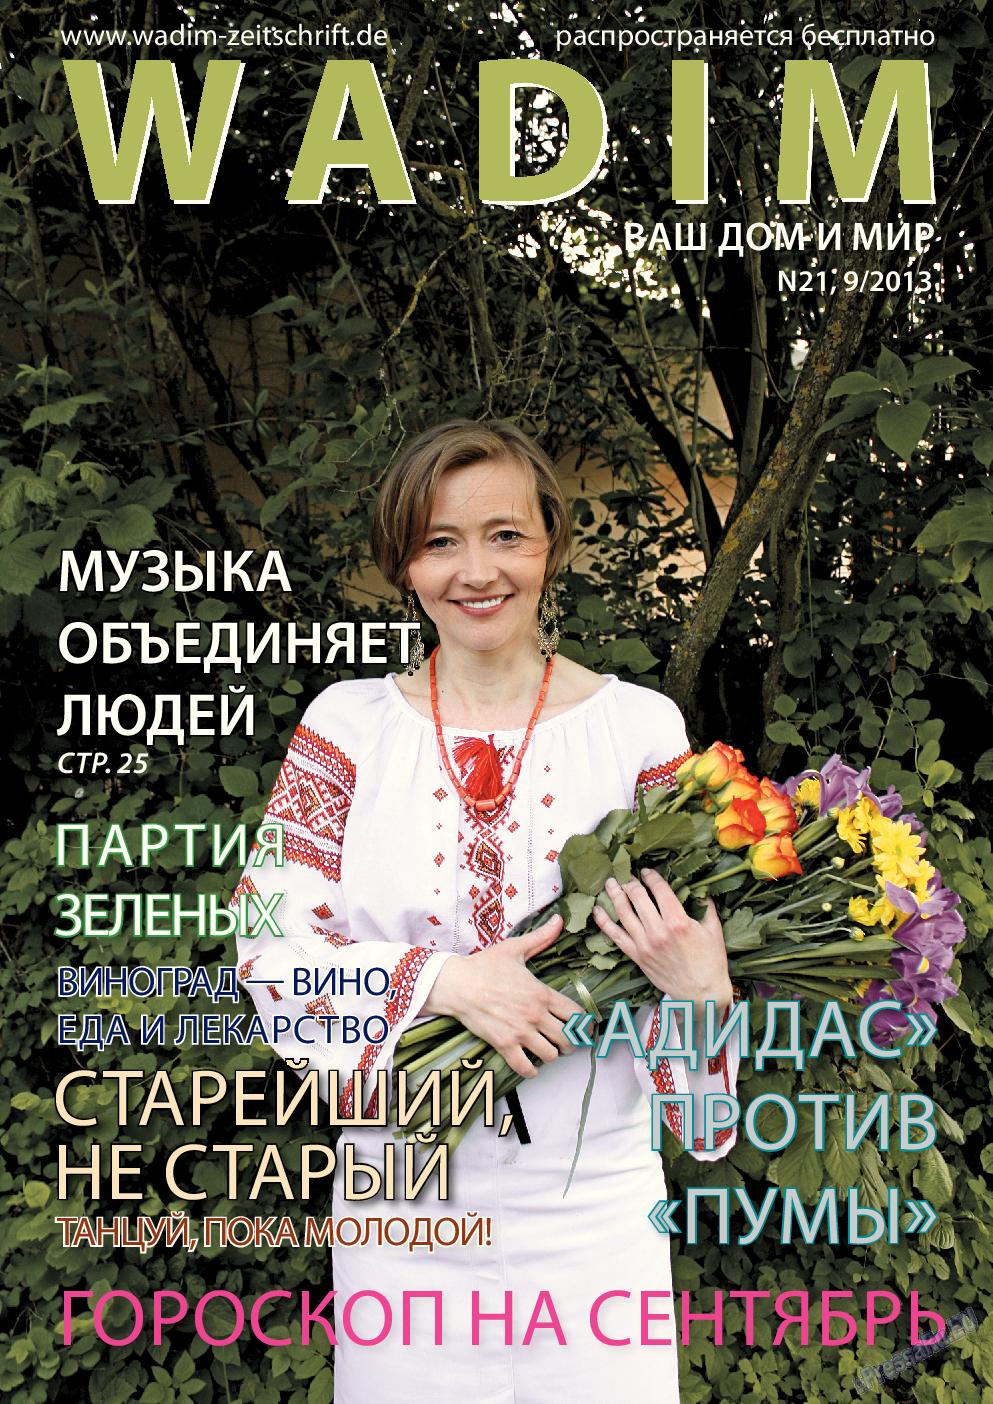 Wadim (журнал). 2013 год, номер 9, стр. 1